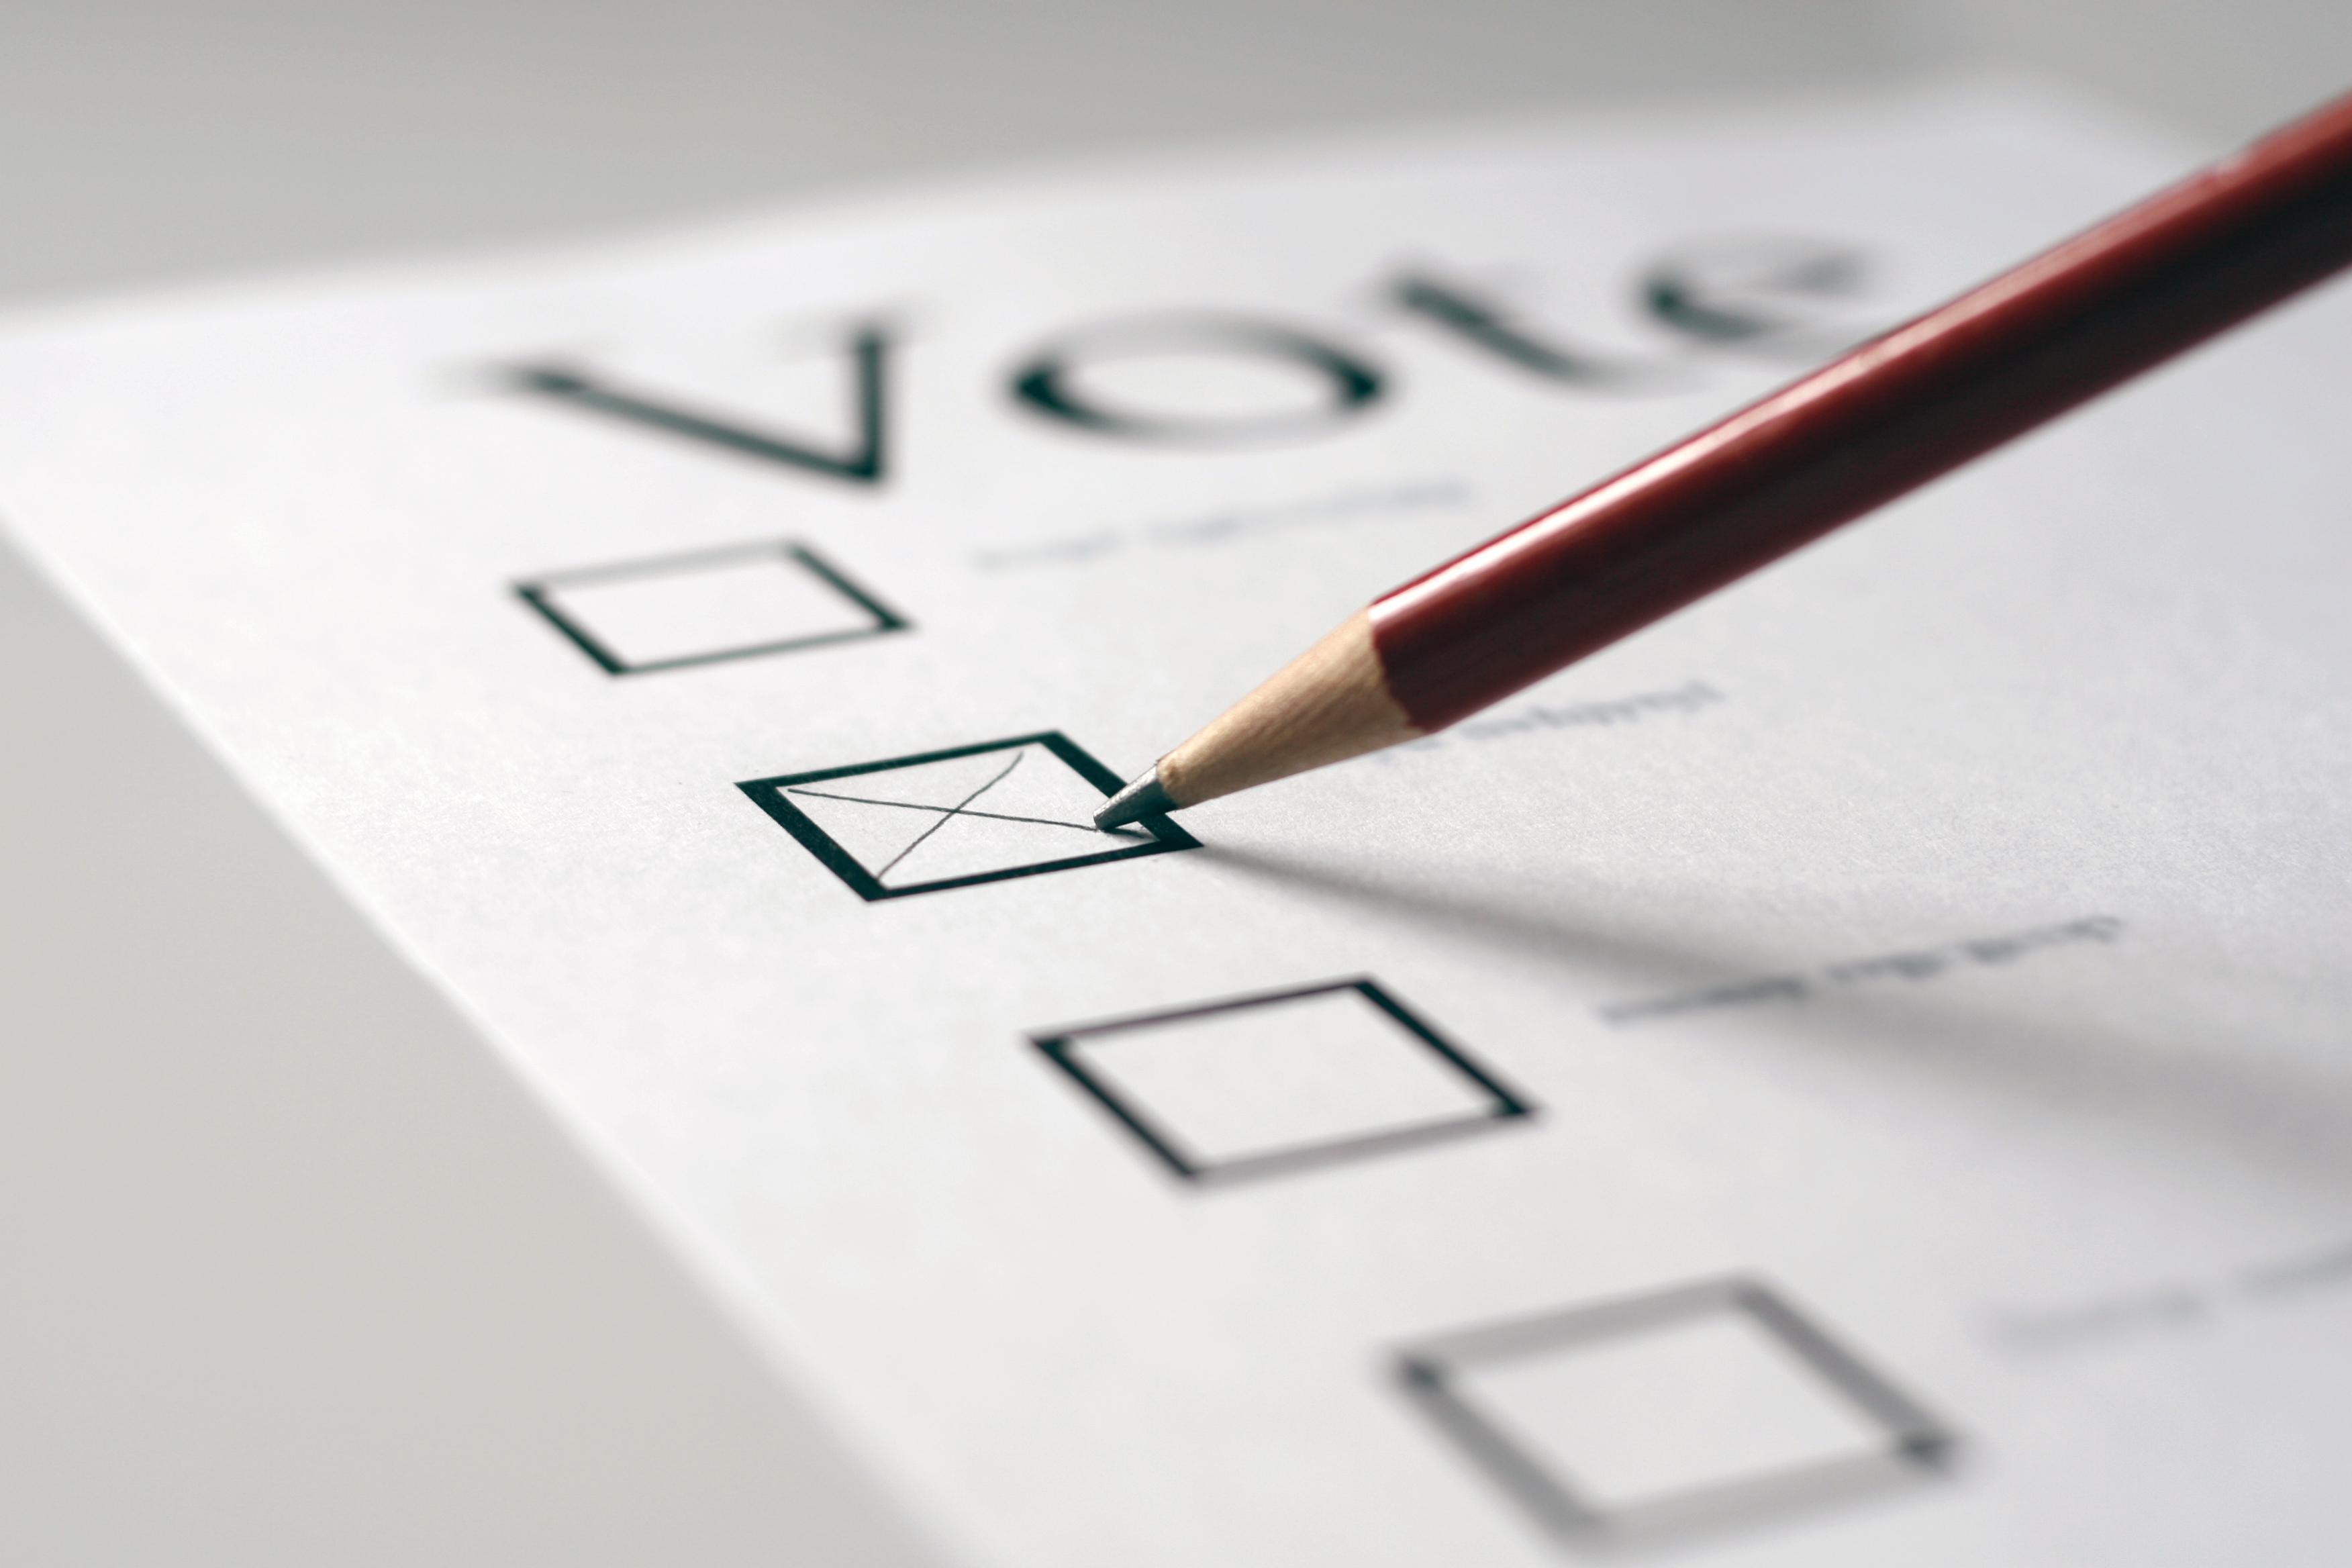 'Taken off like a rocket': Queenslanders voting early in 'massive' numbers